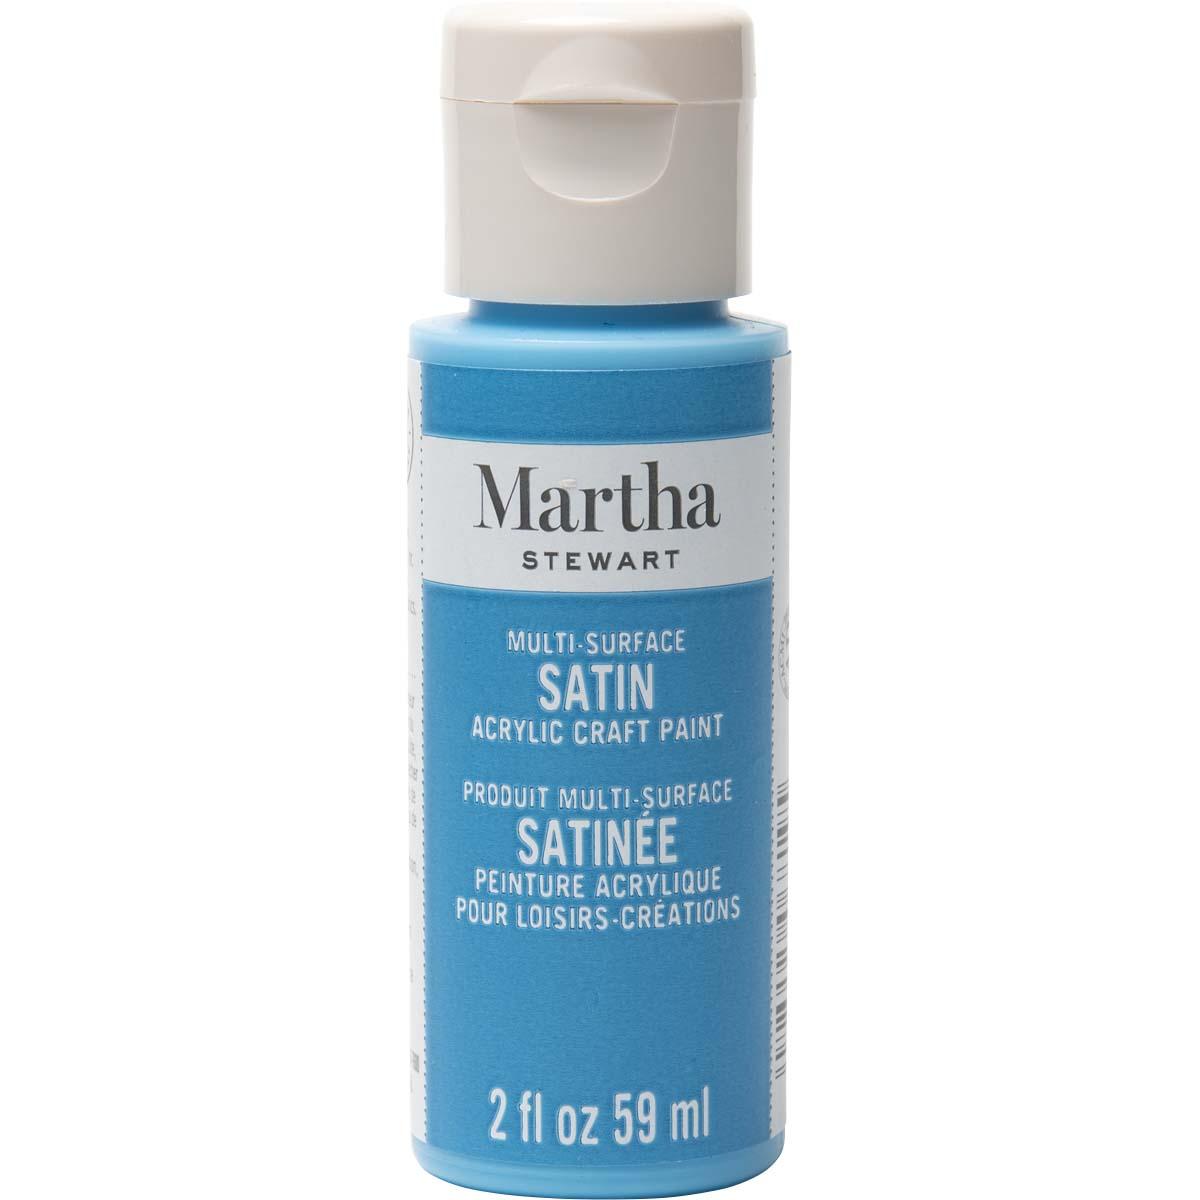 Martha Stewart ® Multi-Surface Satin Acrylic Craft Paint - Rock Candy Blue, 2 oz. - 33567CA